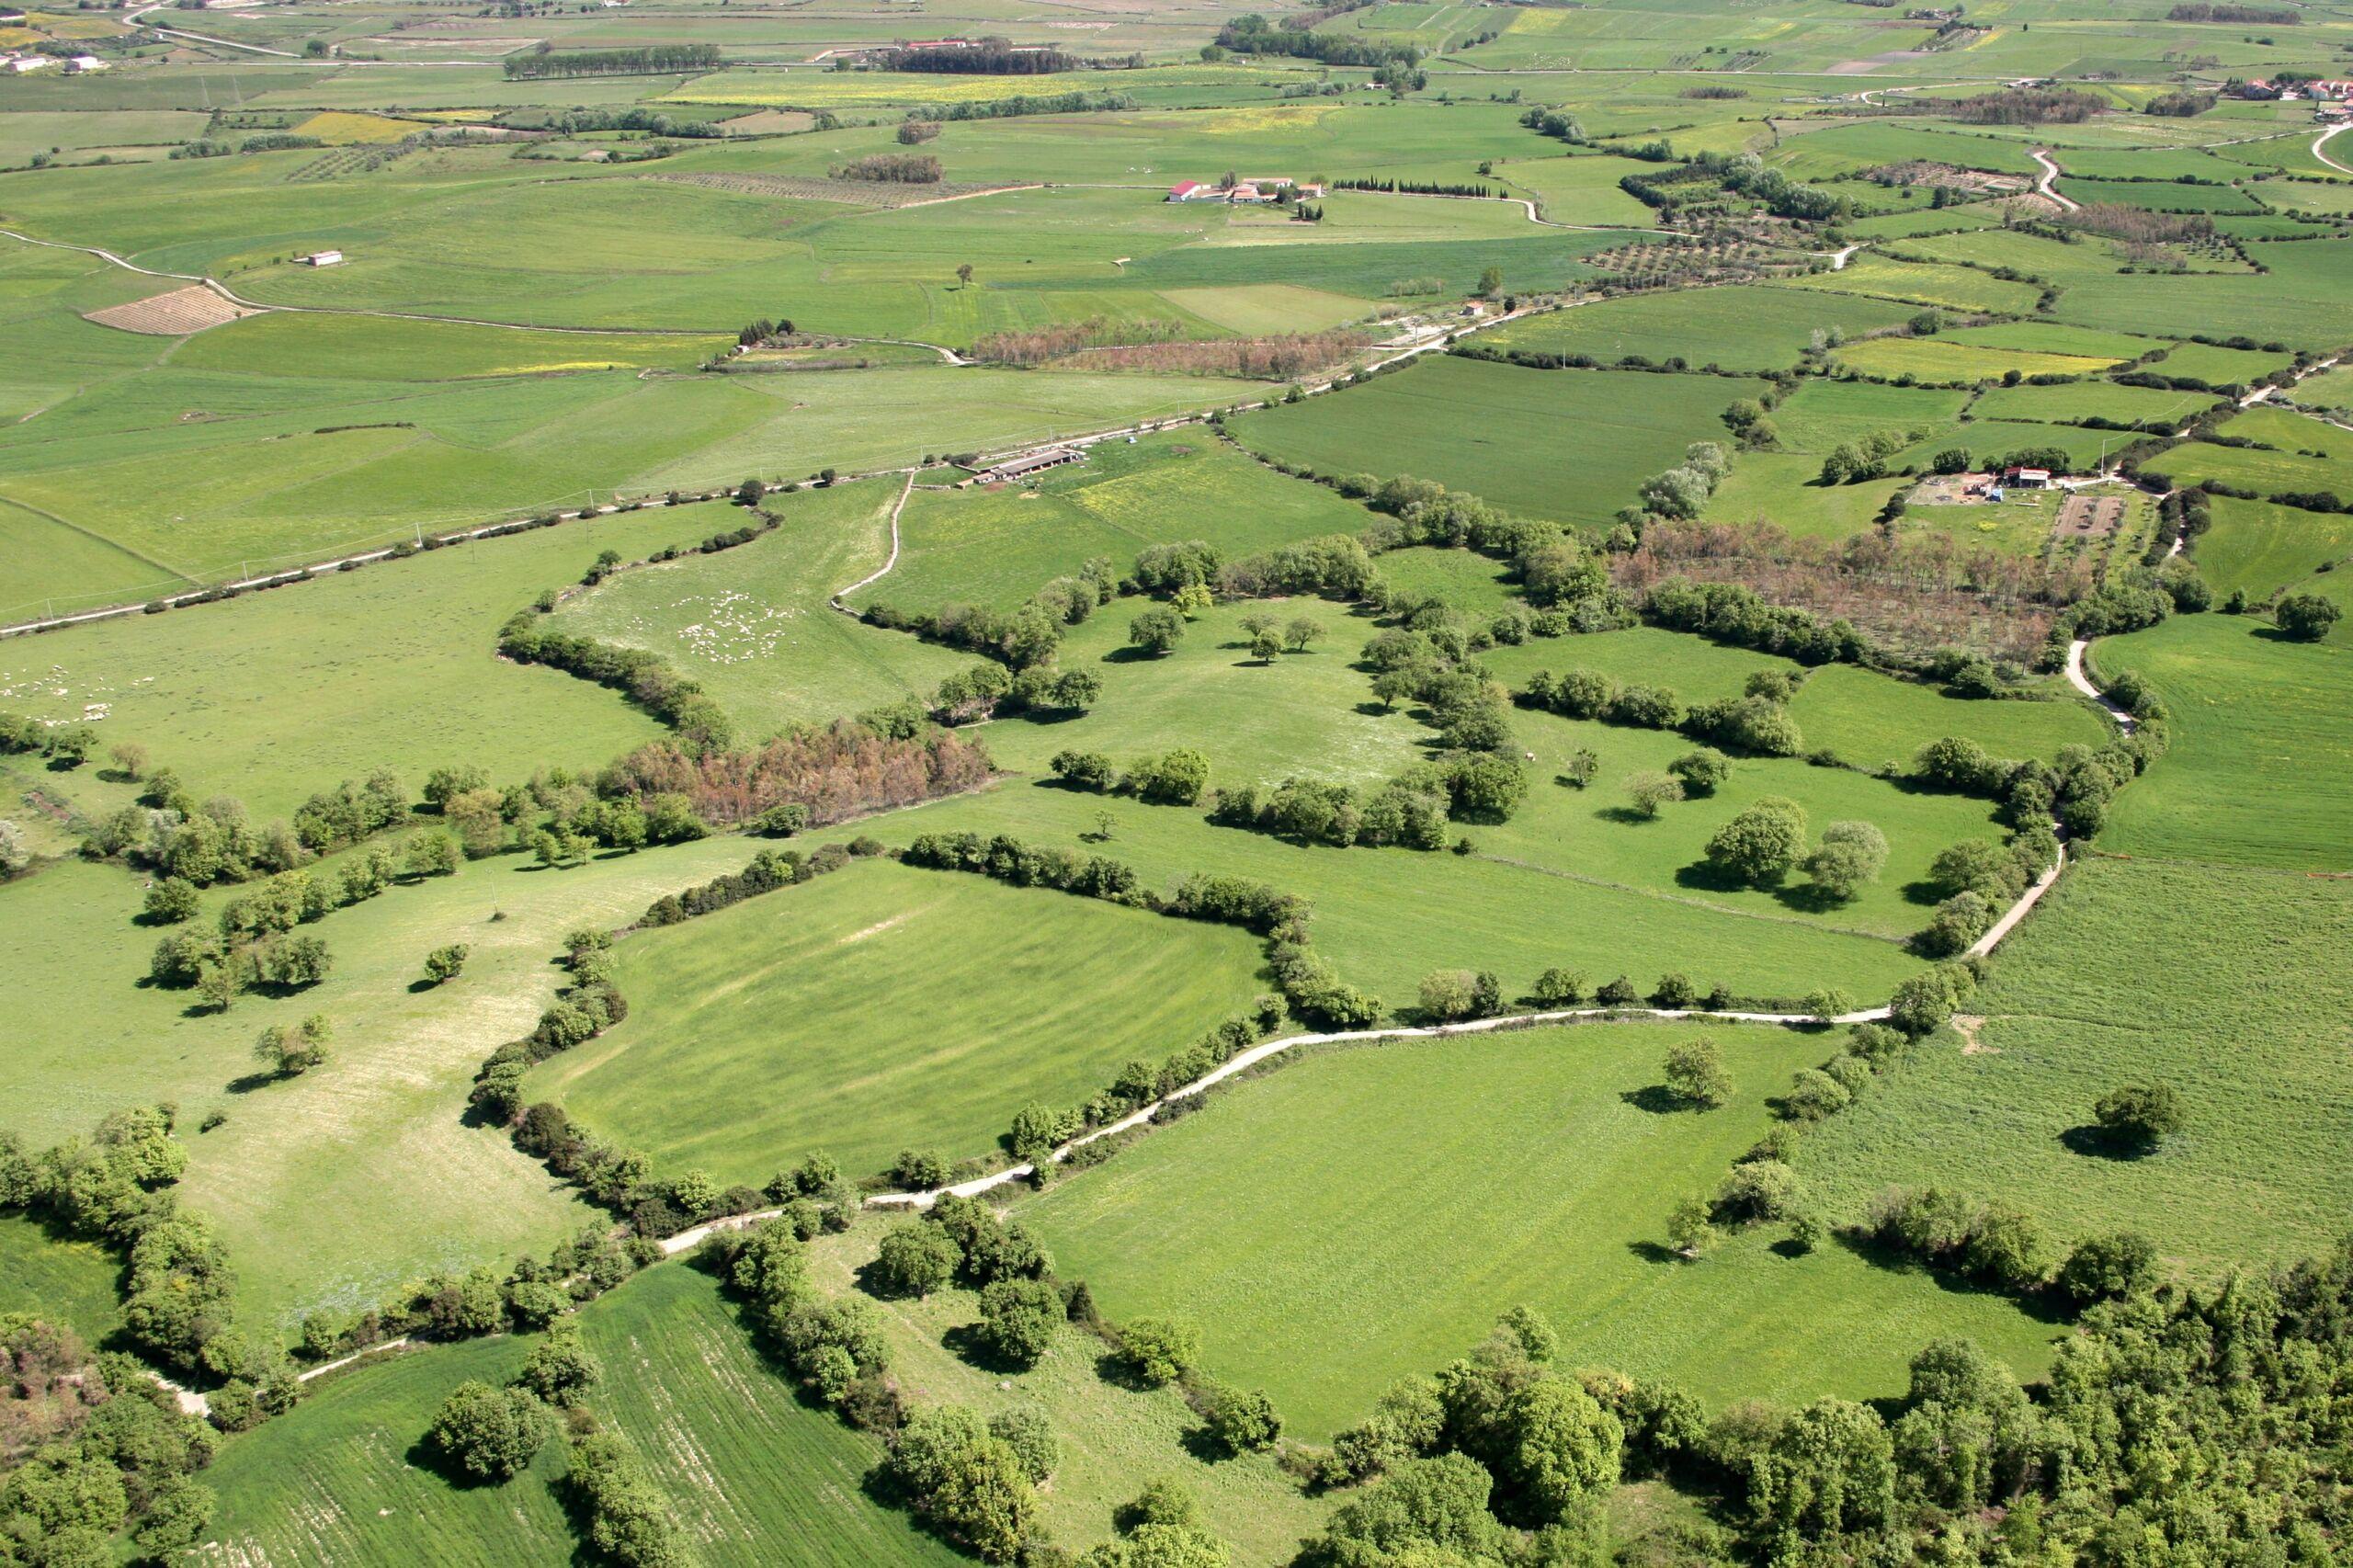 Centro Sardegna visto dall'alto